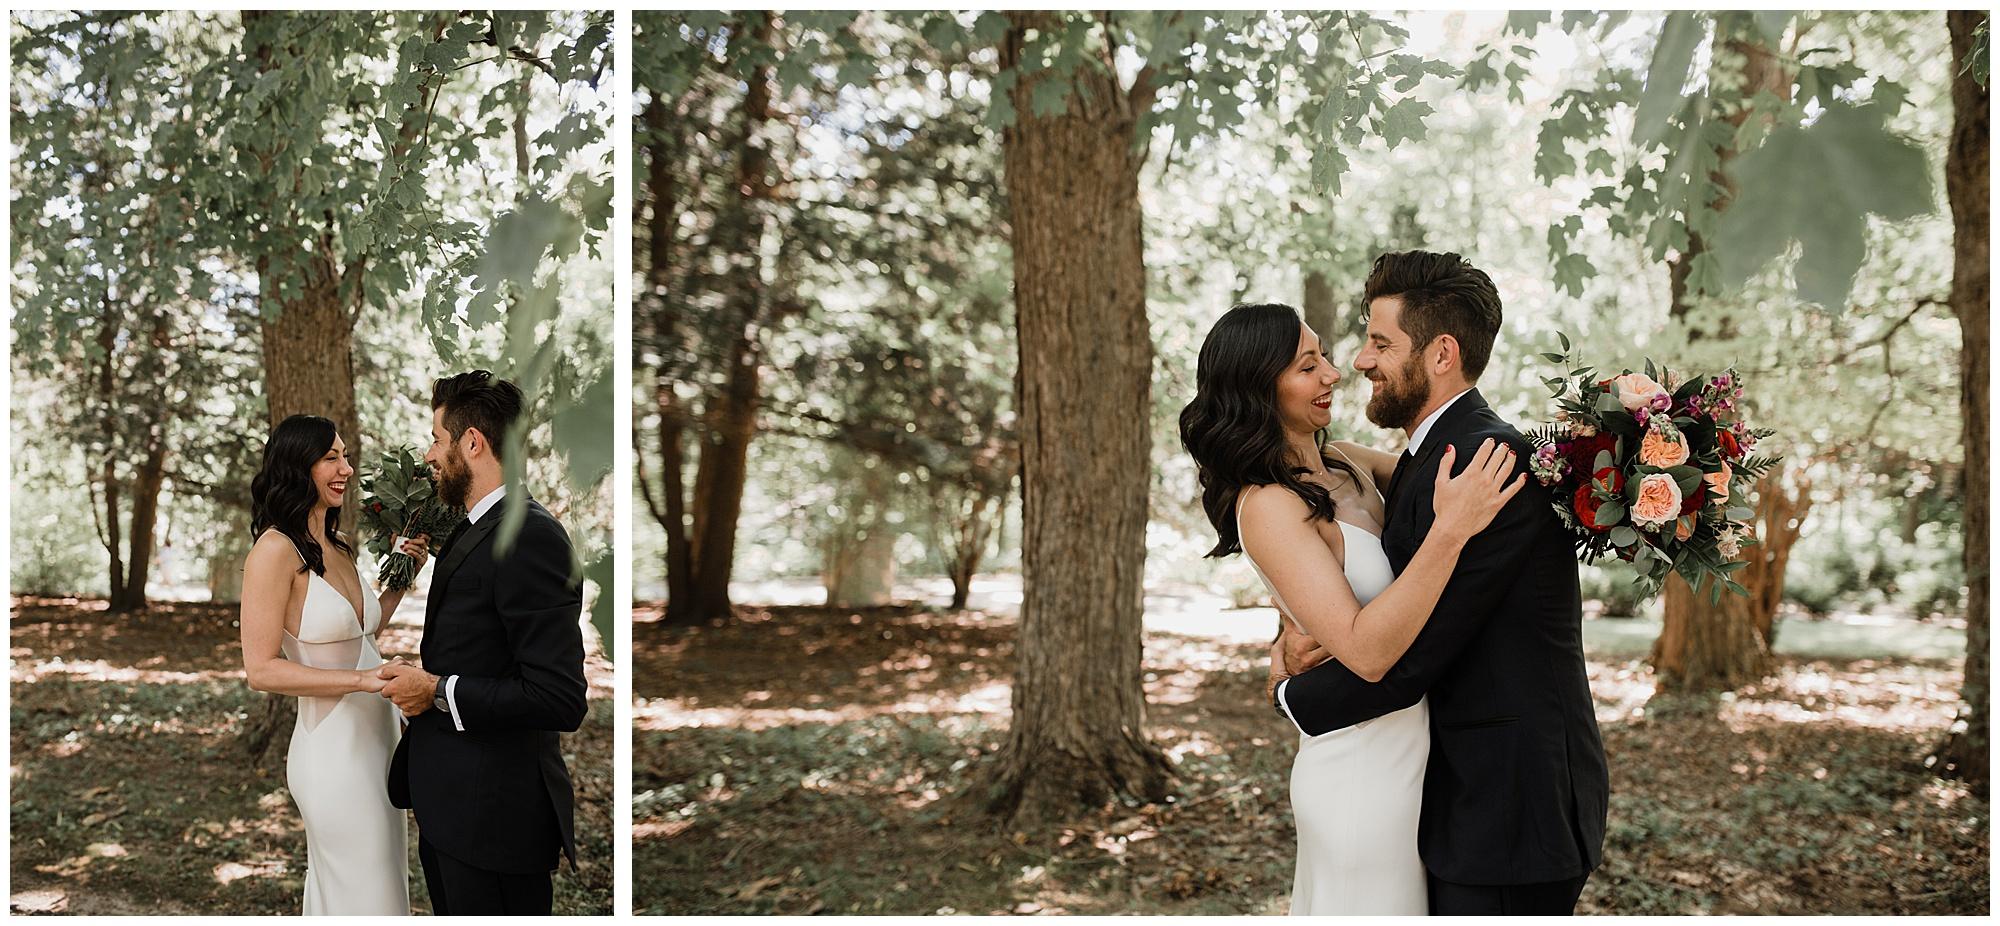 allerton_park_wedding_champaign_il_chicago_wright_photographs_ne_0008.jpg